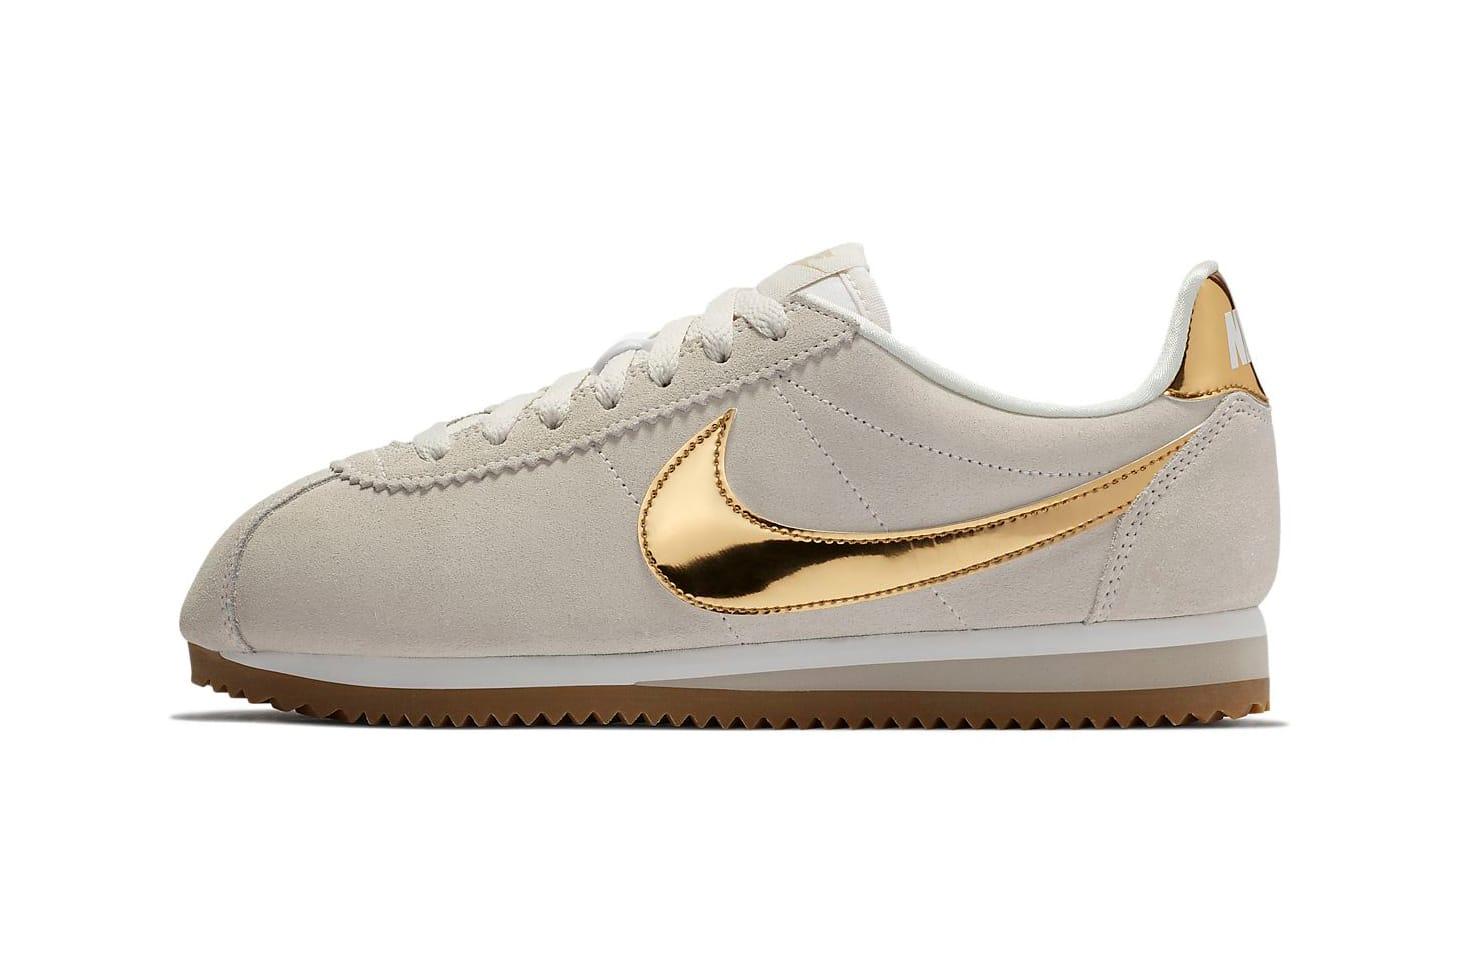 Nike Cortez Phantom with Metallic Gold